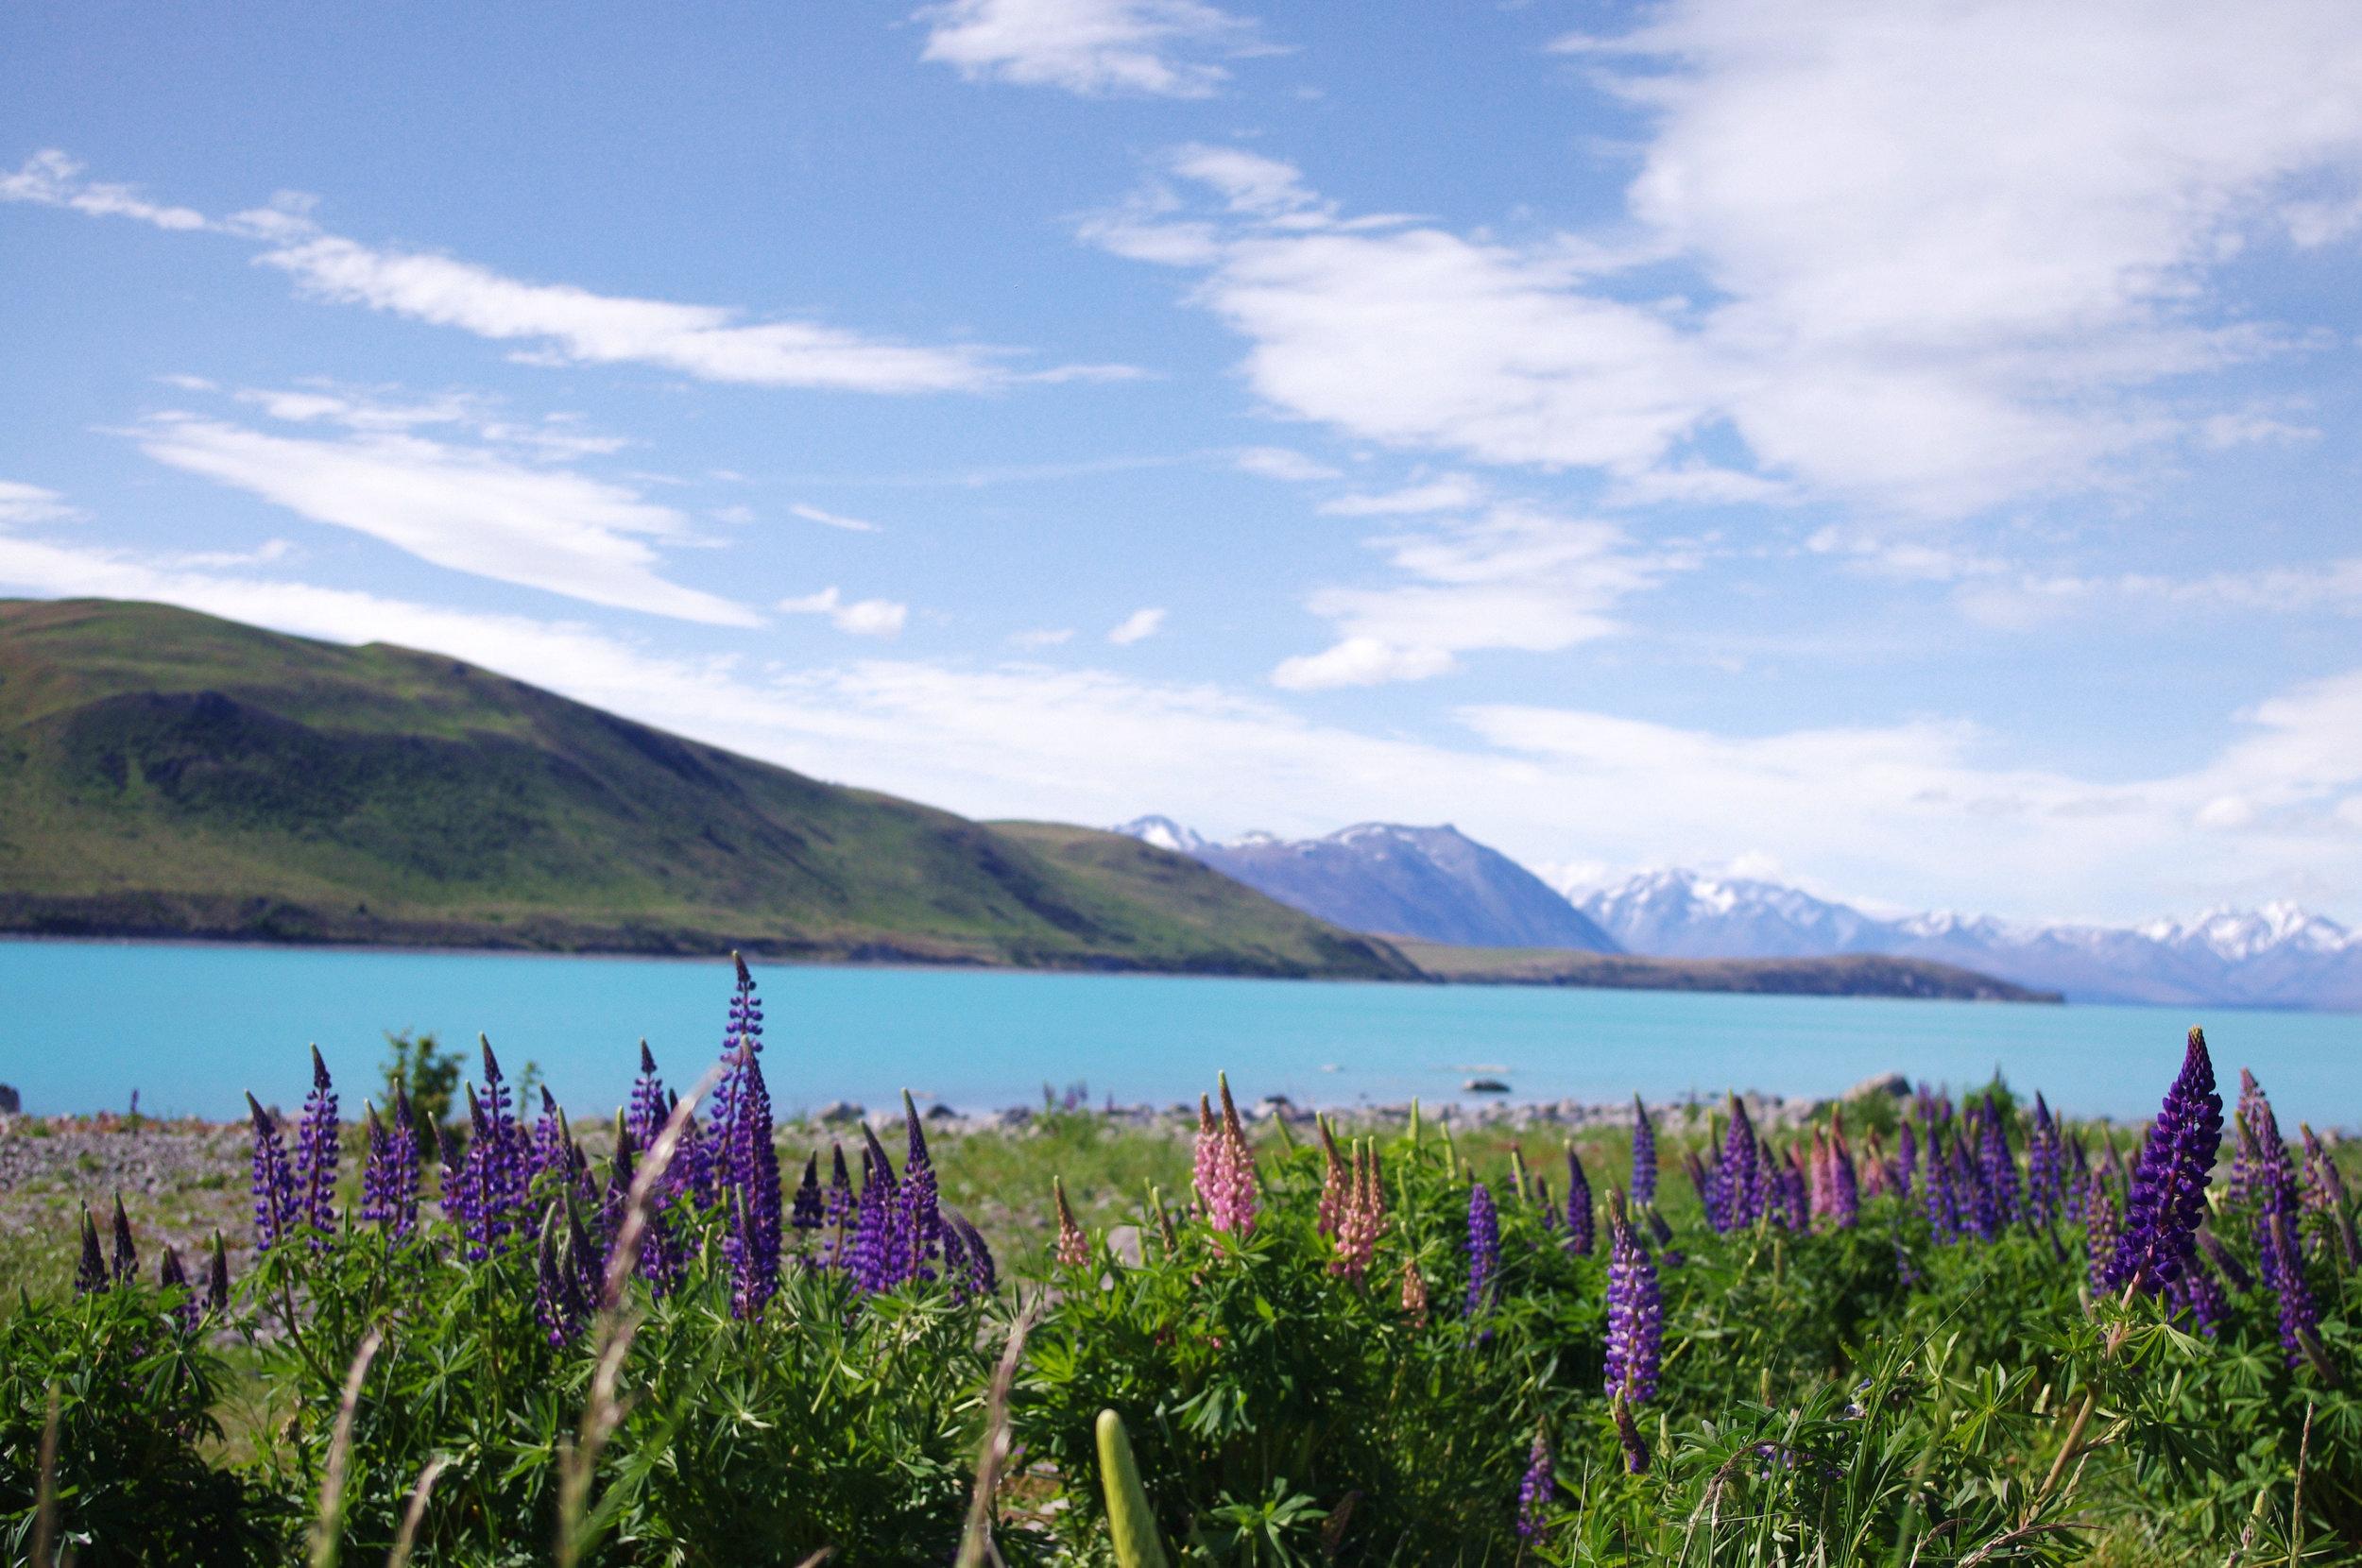 alpine-bloom-blossom-62344ps.jpg